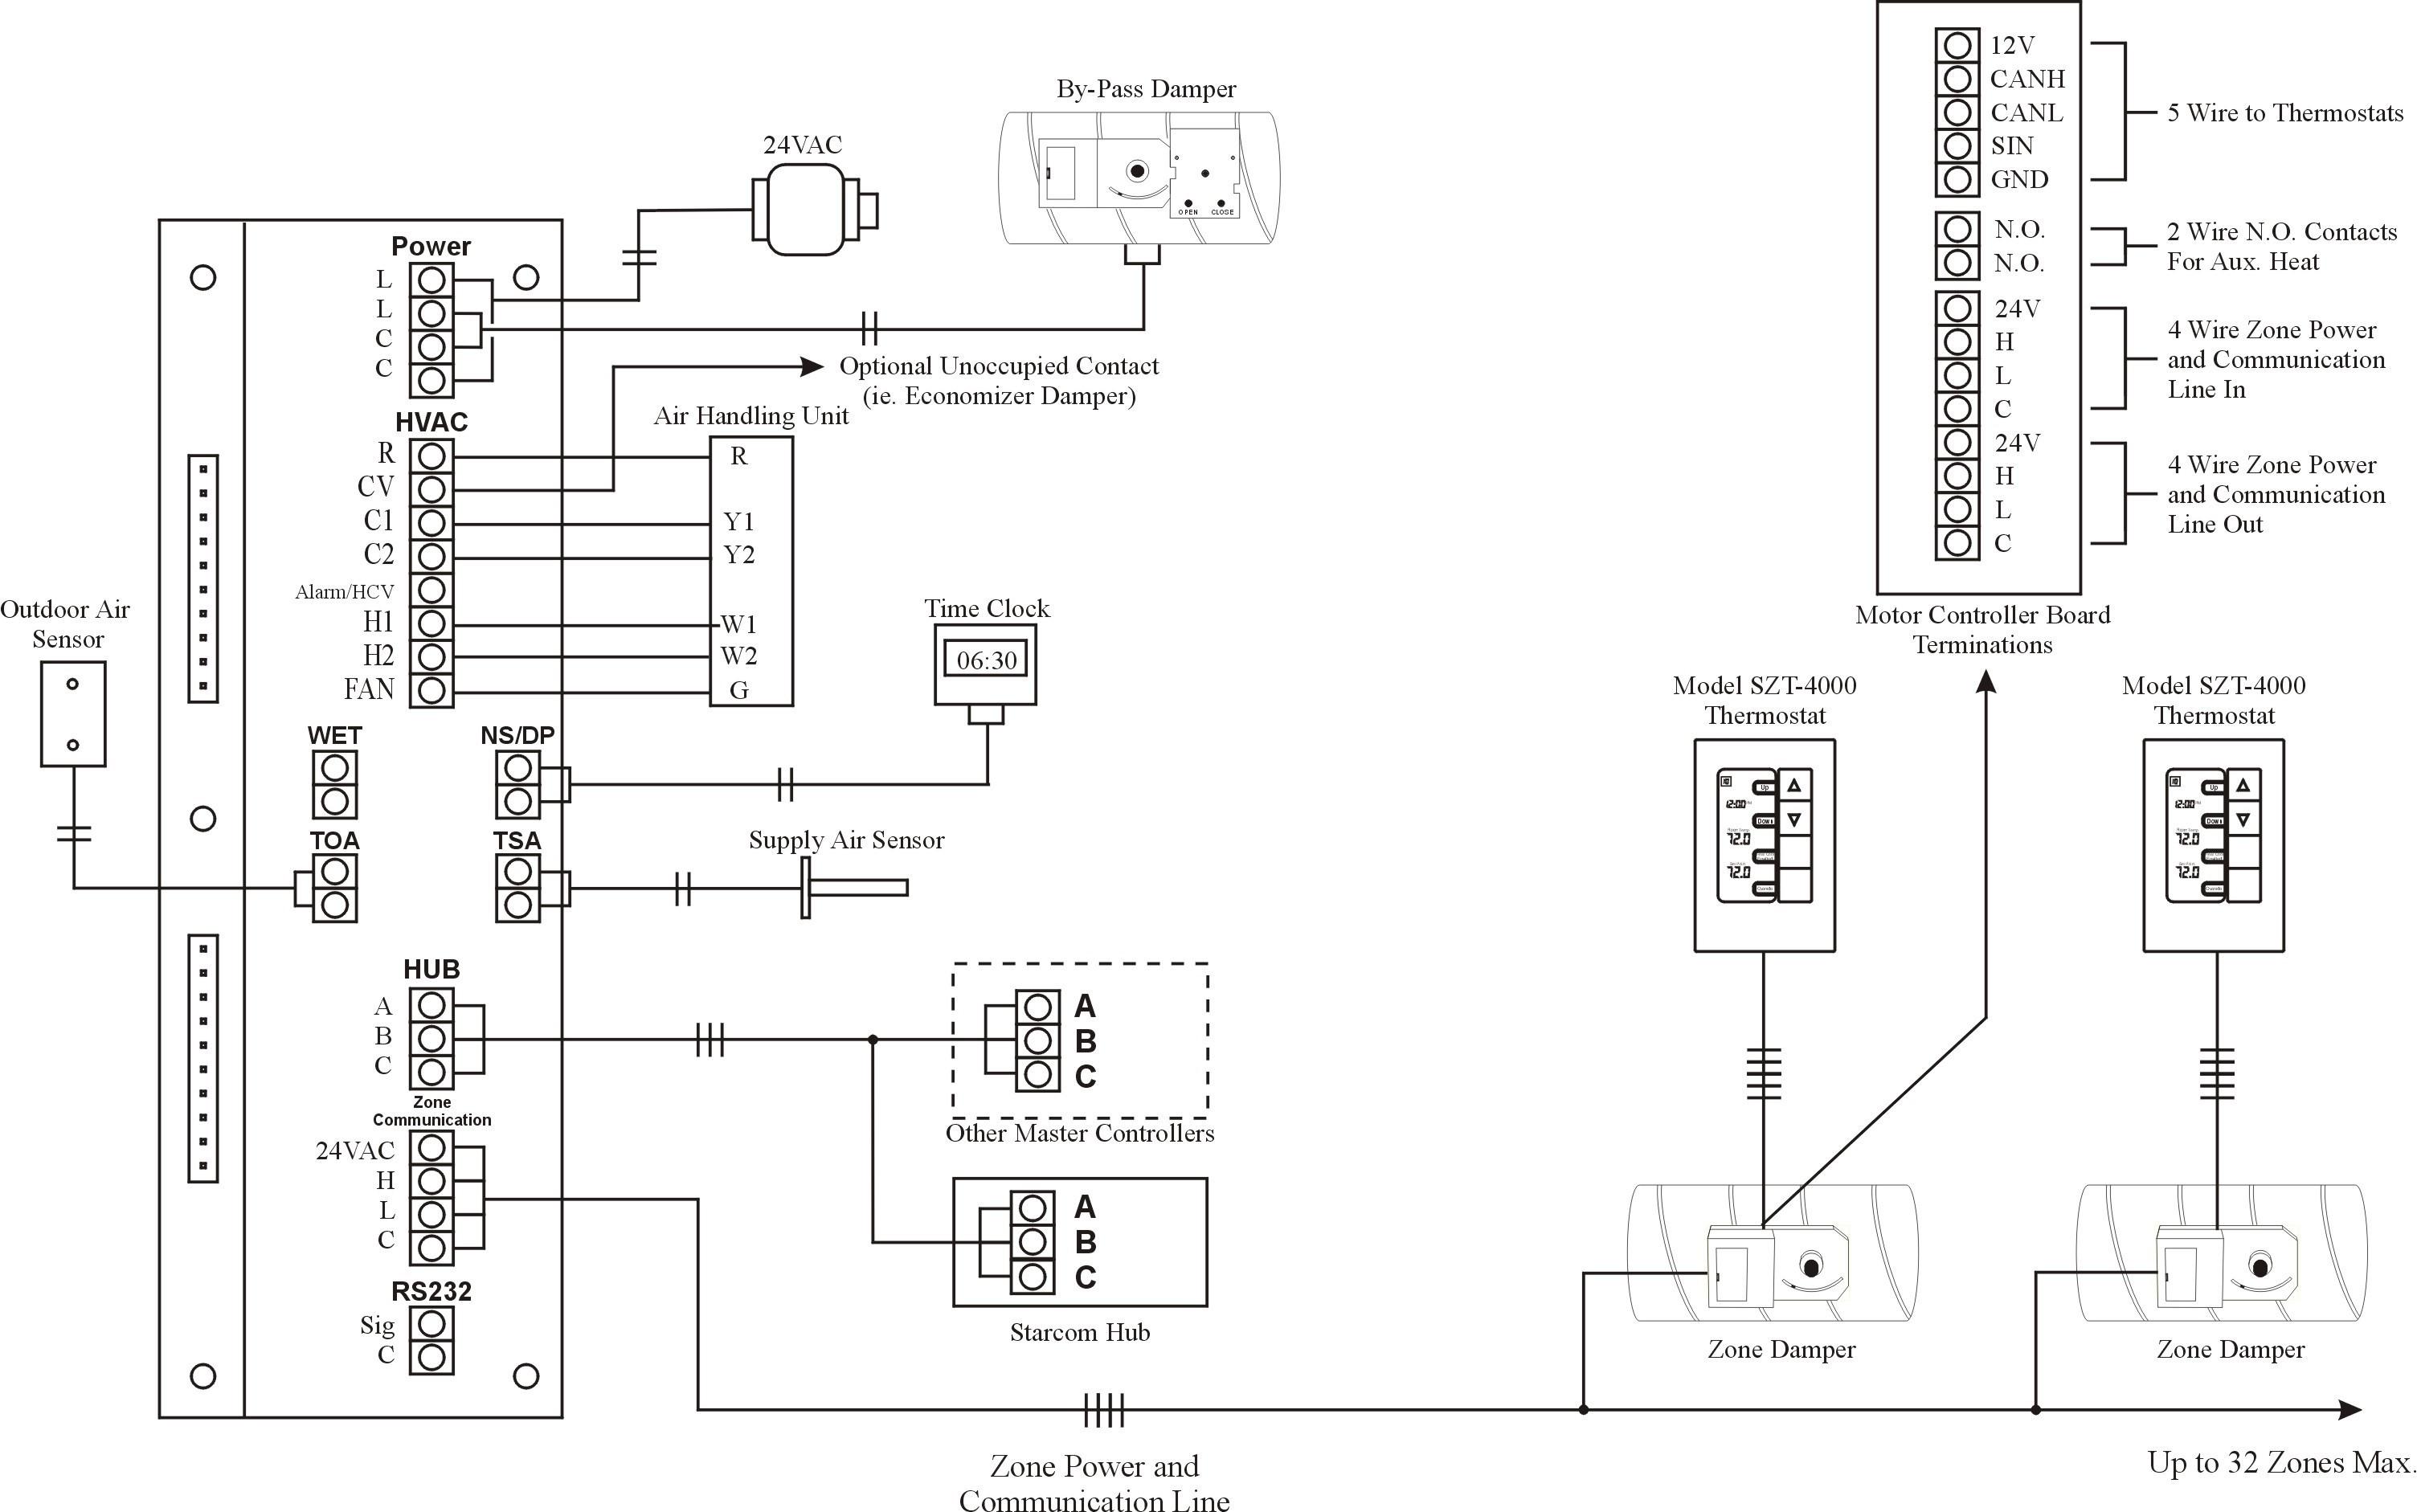 Adt Focus Wiring Diagram | Wiring Diagram on